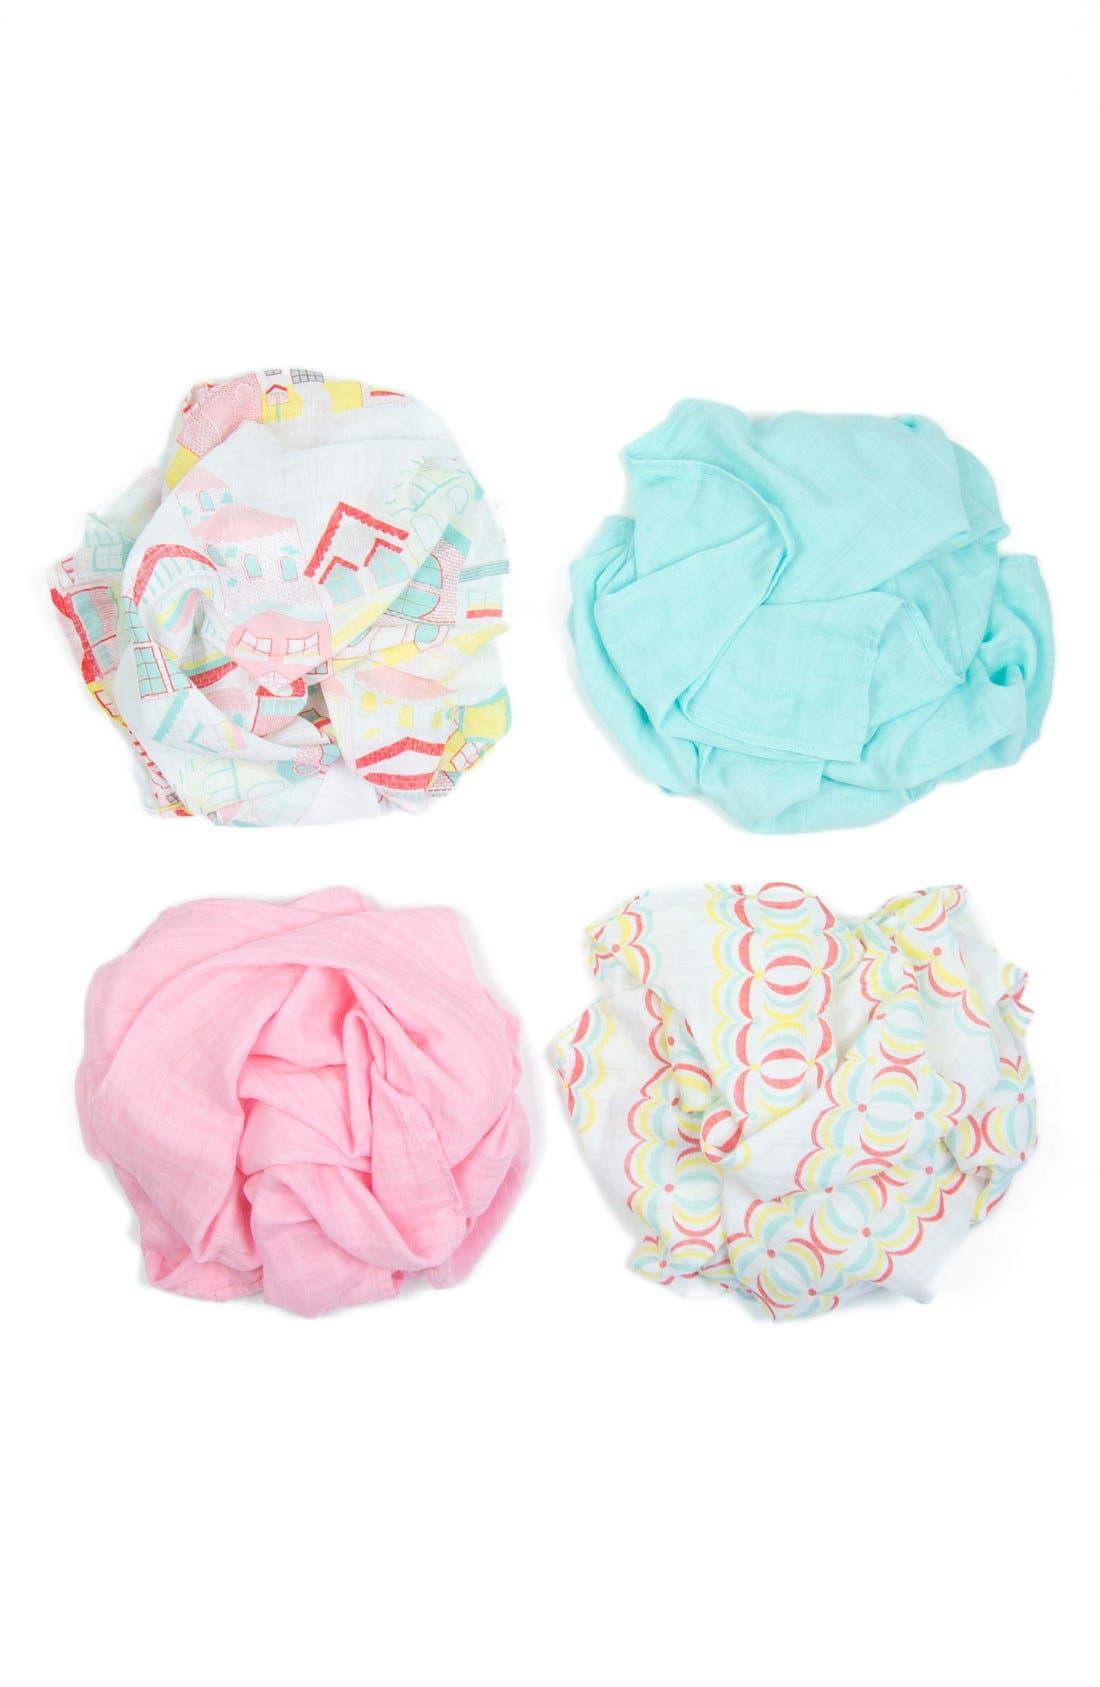 Main Image - The Little Linen Company 'Weegoamigo' Muslin Swaddle Blanket (4-Pack)